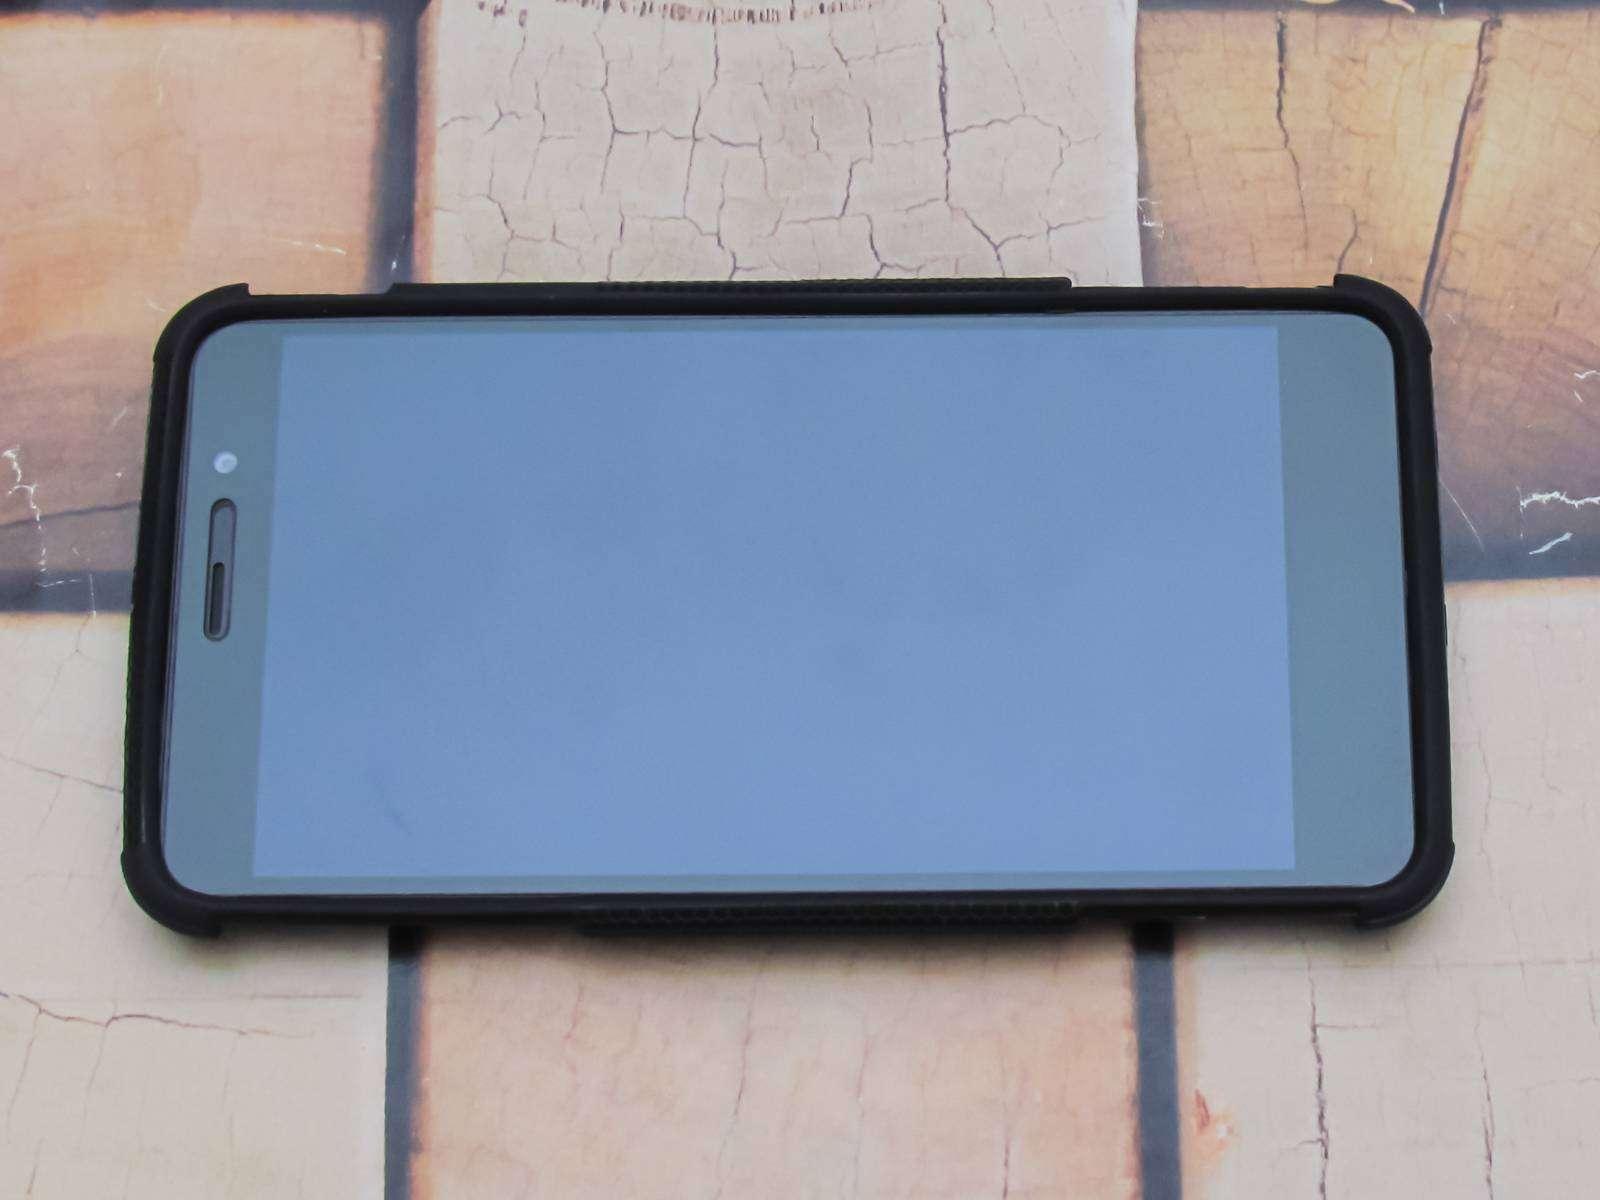 Aliexpress: Защитный чехол-подставка для Xiaomi Redmi Note 3